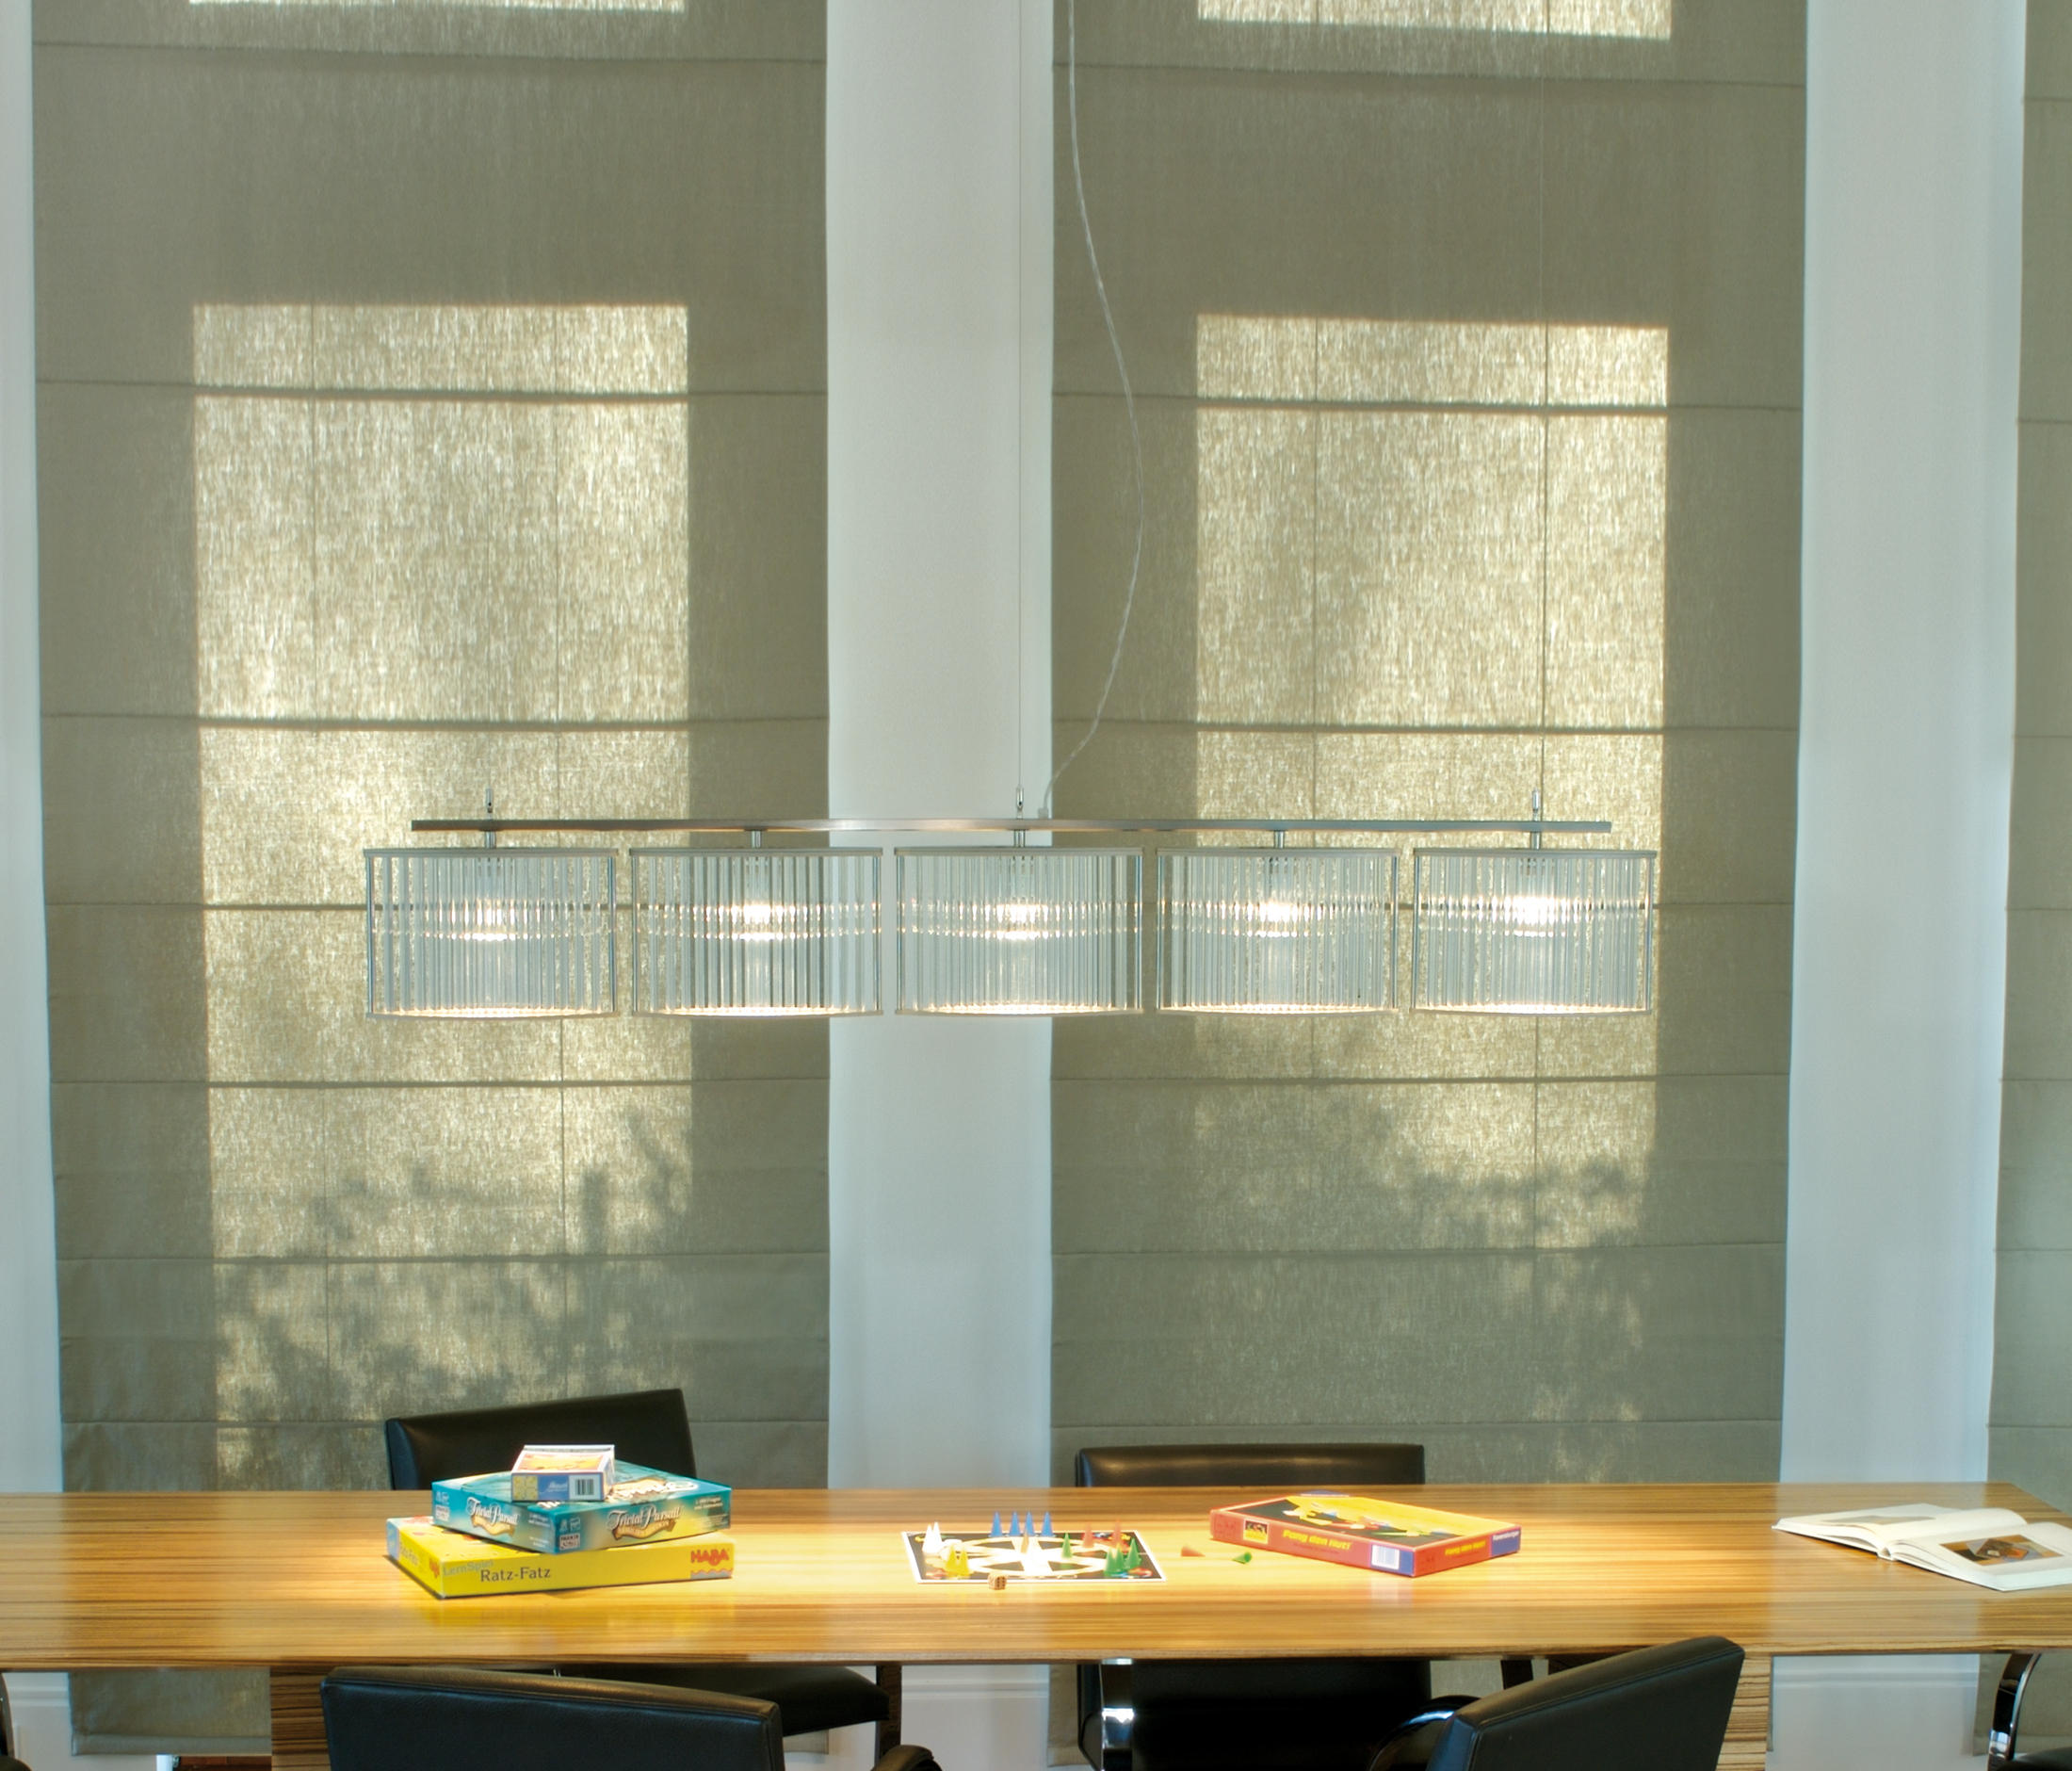 stilio 5 general lighting from licht im raum architonic. Black Bedroom Furniture Sets. Home Design Ideas